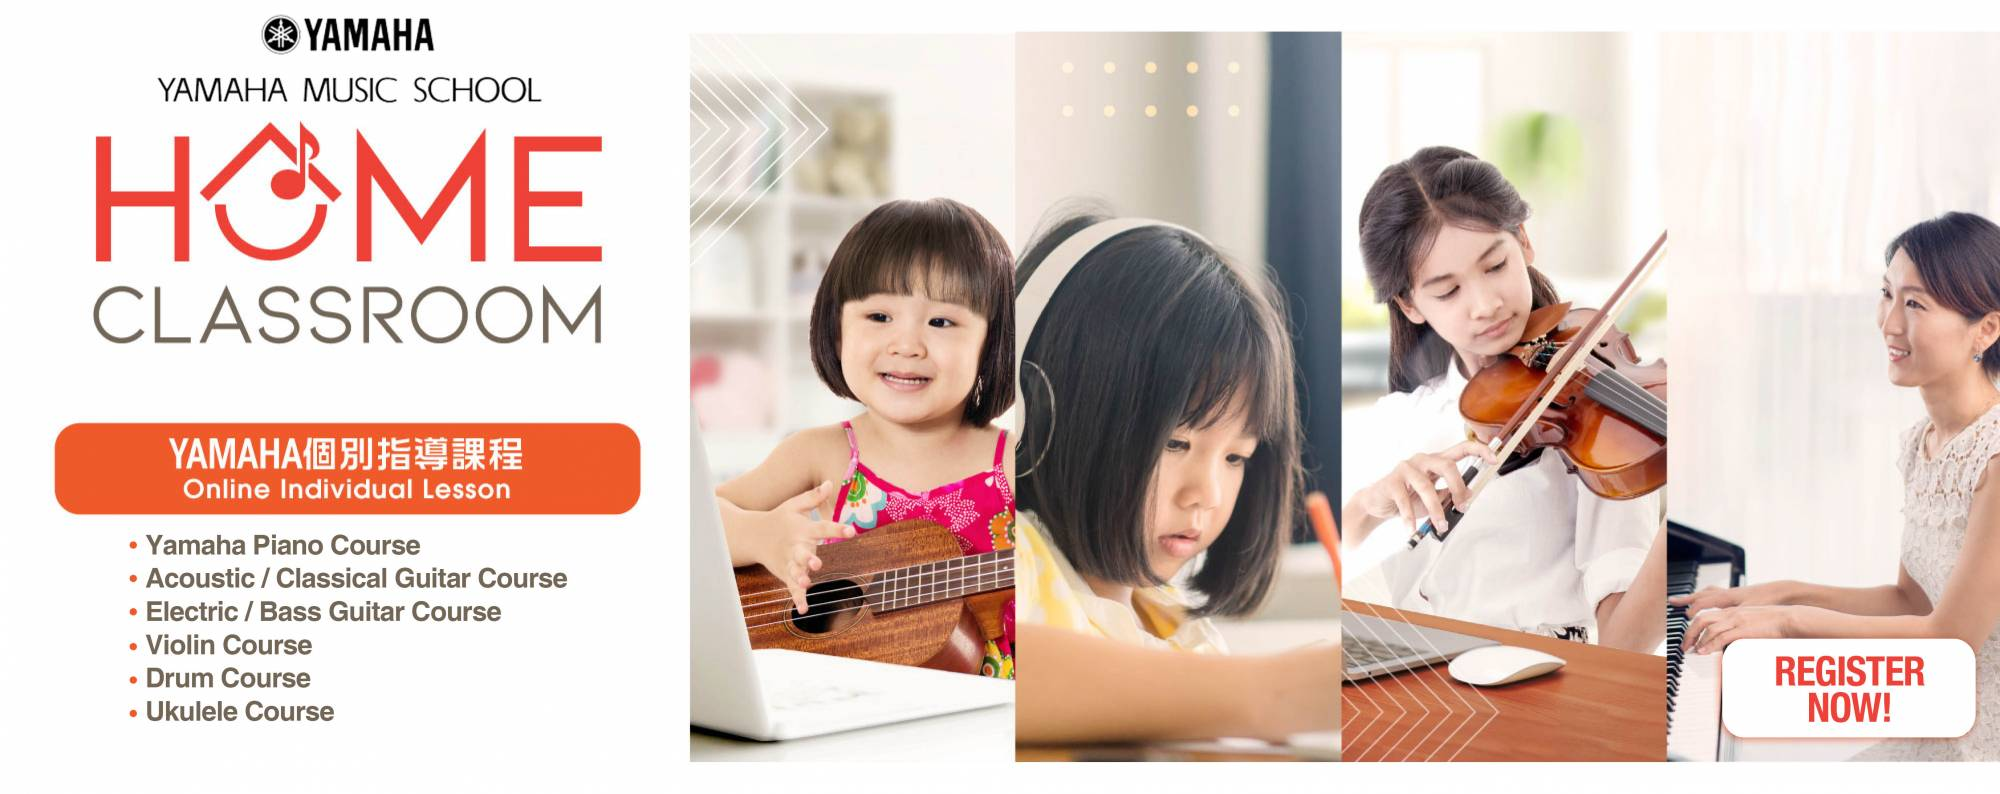 Yamaha Home Classroom